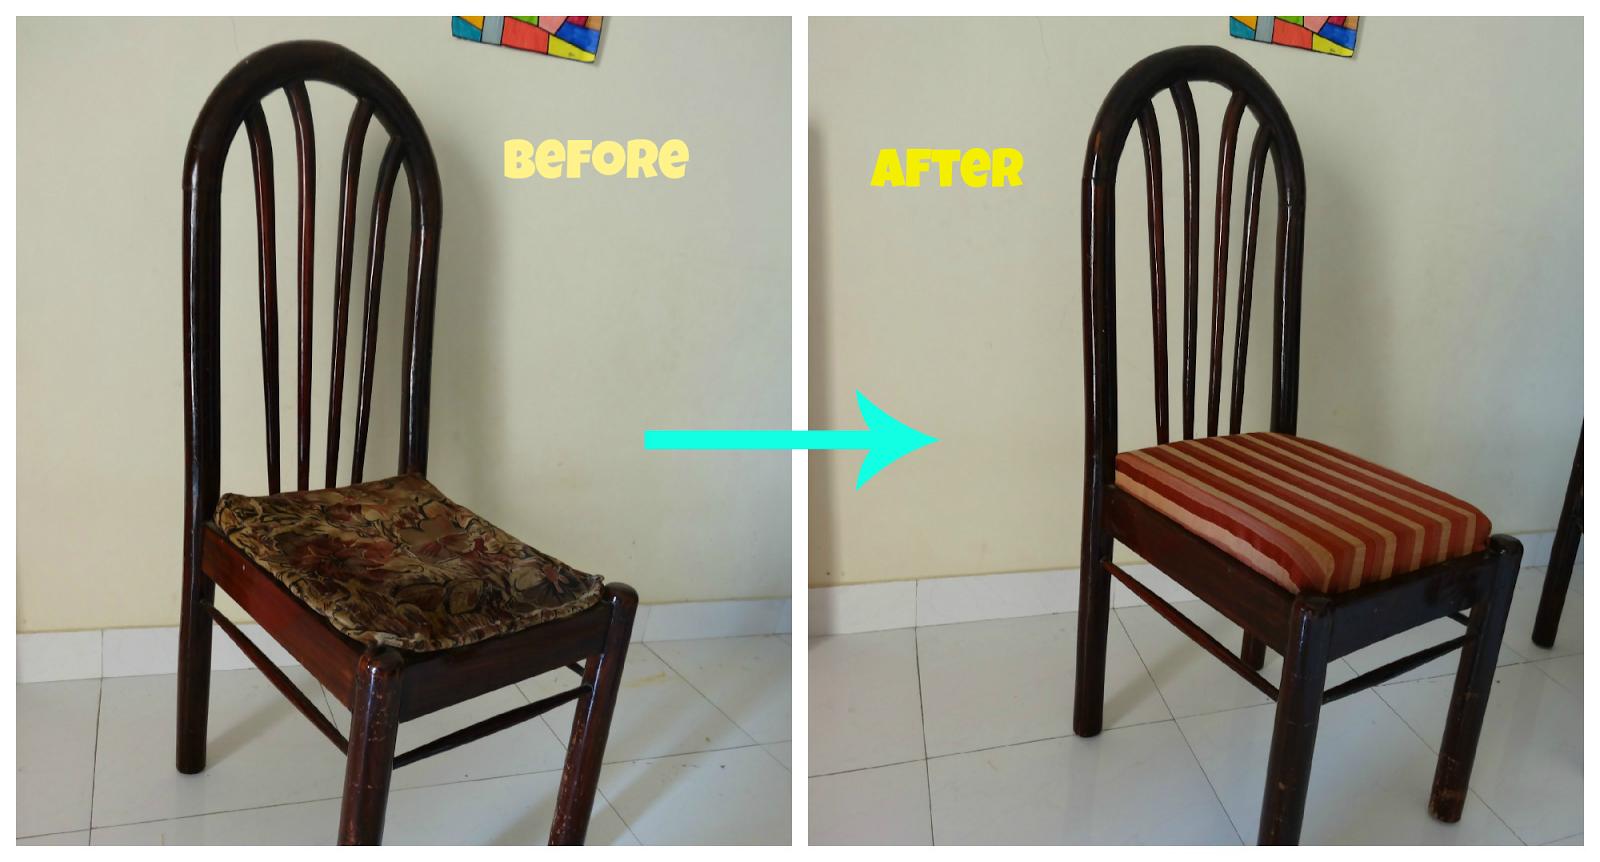 NichuSpace Upholster a chair